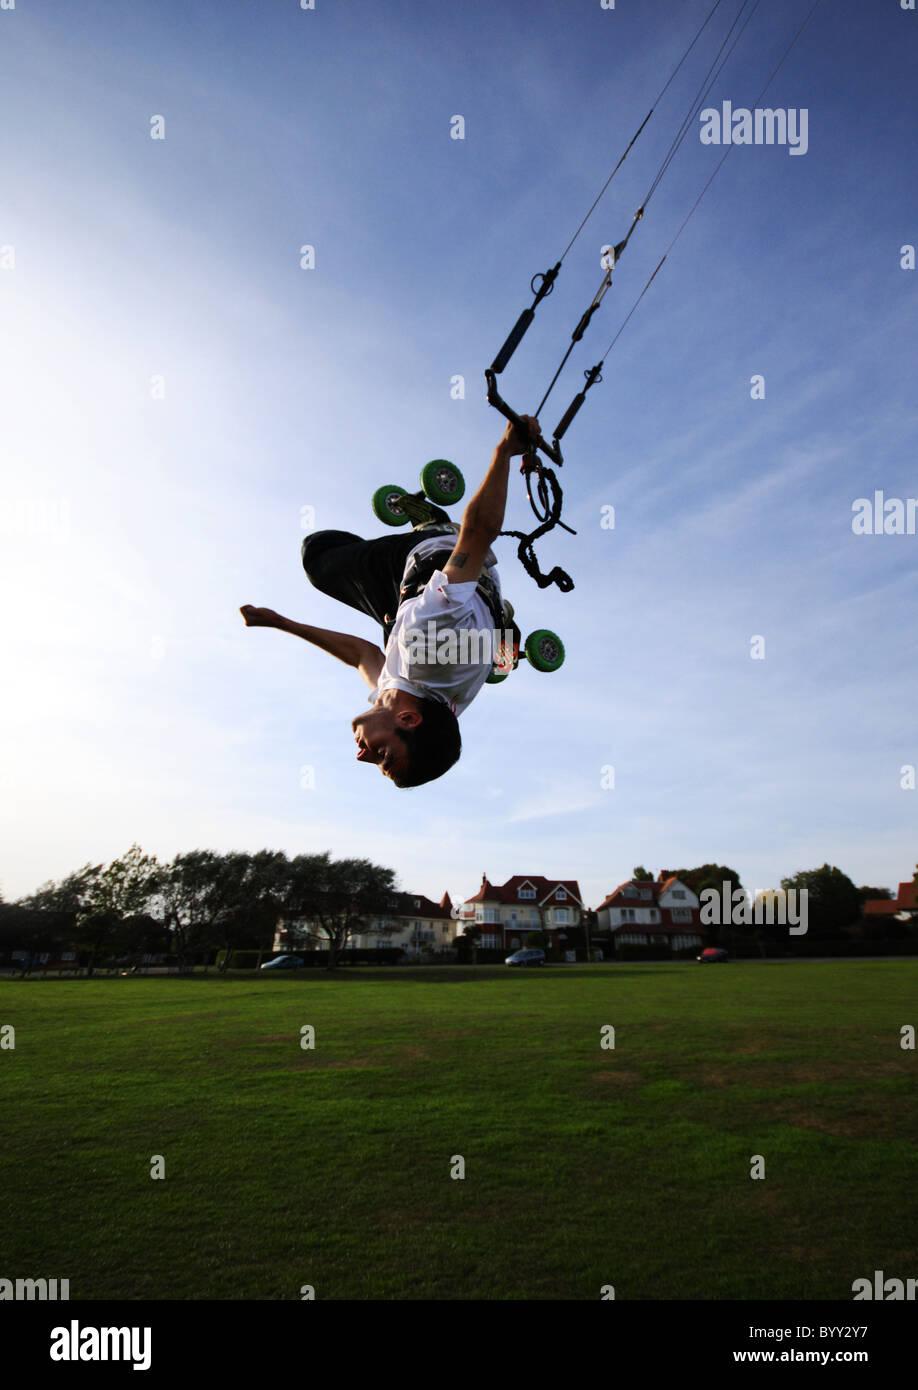 Extreme sport kiteboarding Kitesurfing in Frinton-on-Sea - Stock Image